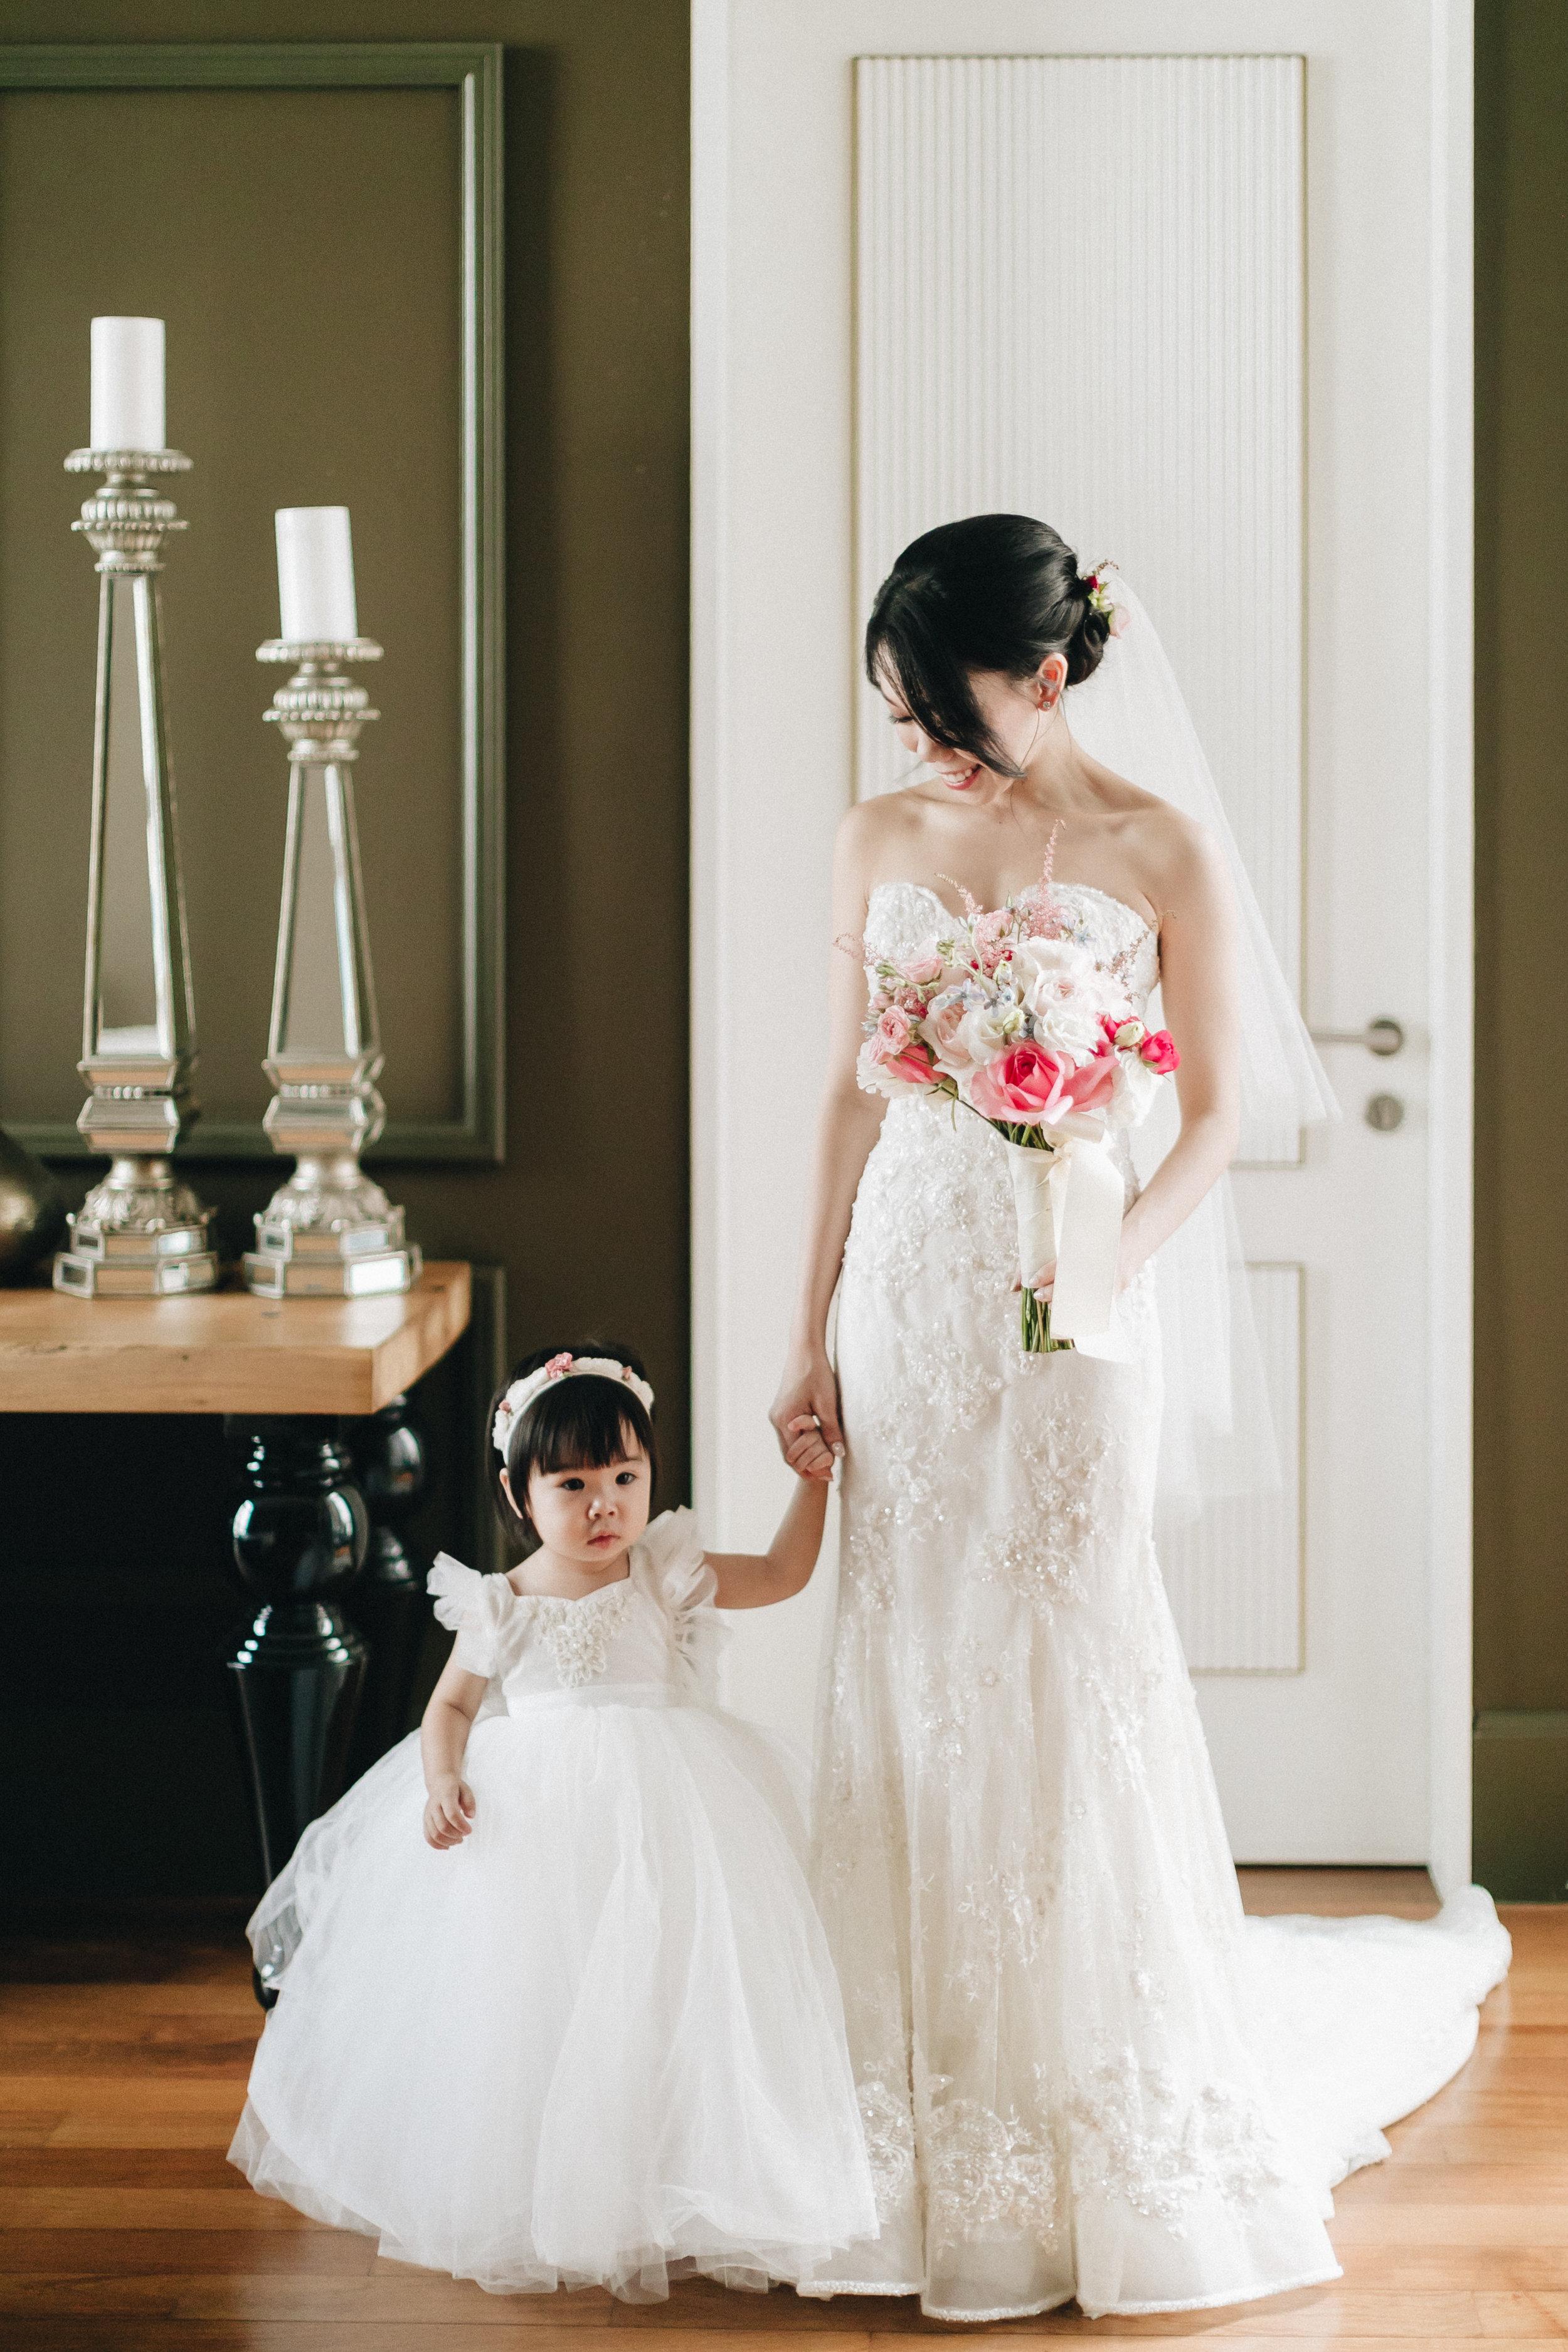 TZE LIN + JUN KHAI - Wedding @ Canteloupe, The Troika